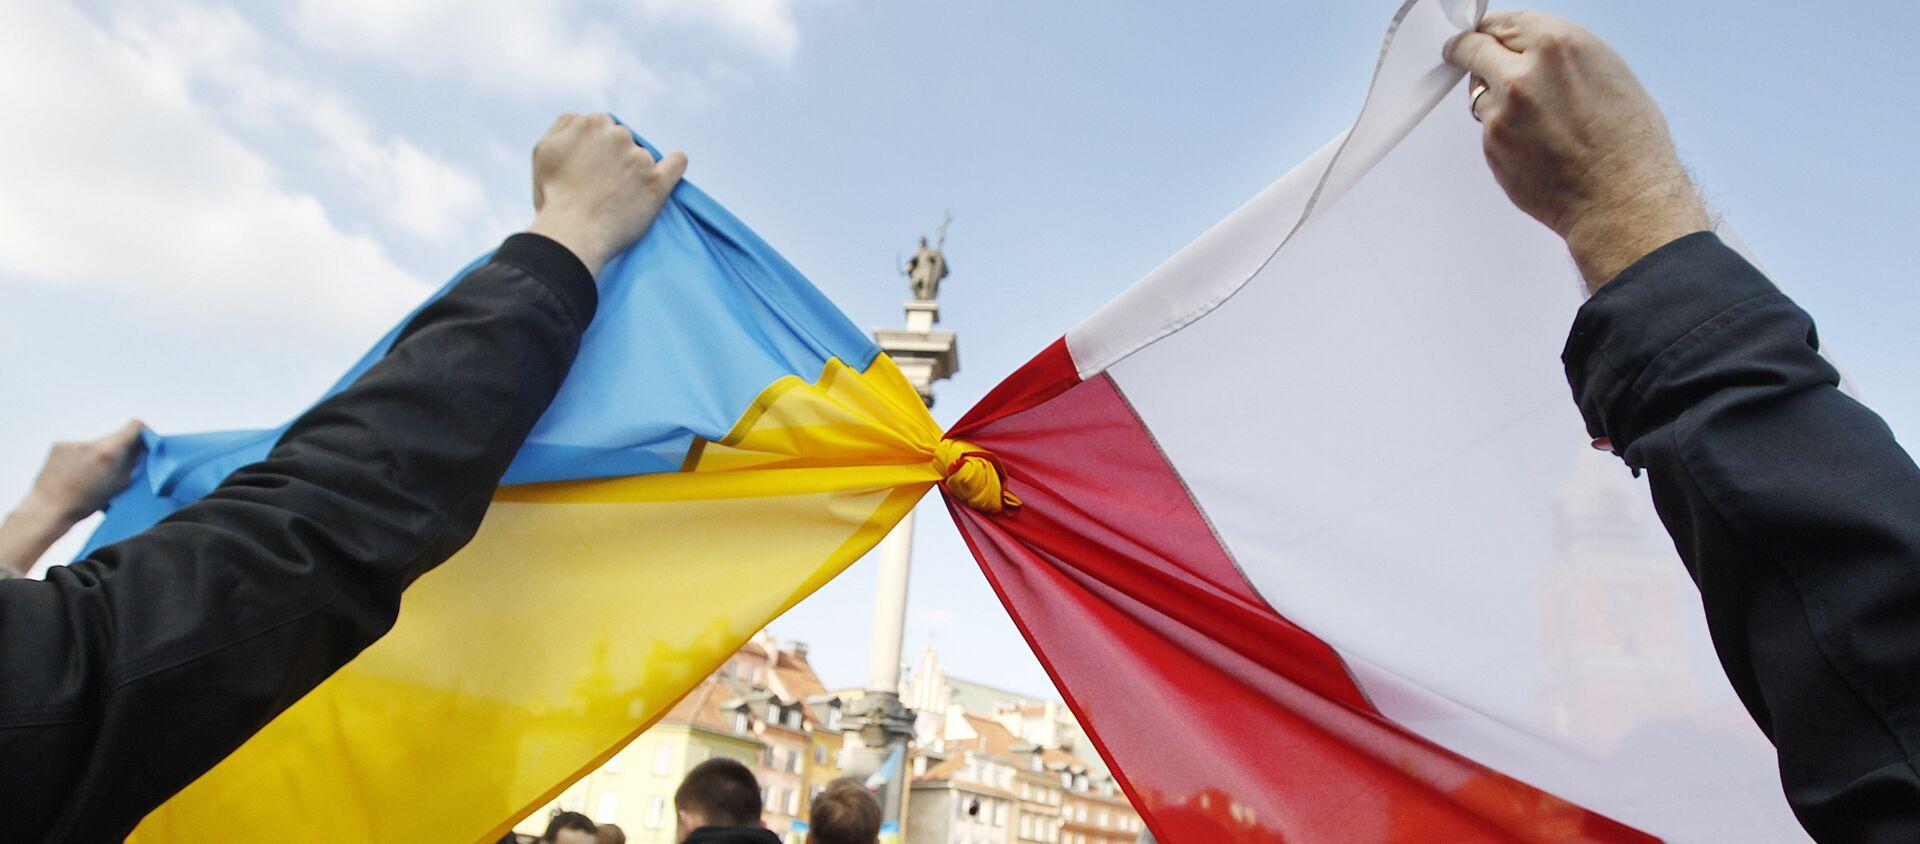 Flagi Polski i Ukrainy - Sputnik Polska, 1920, 21.04.2021